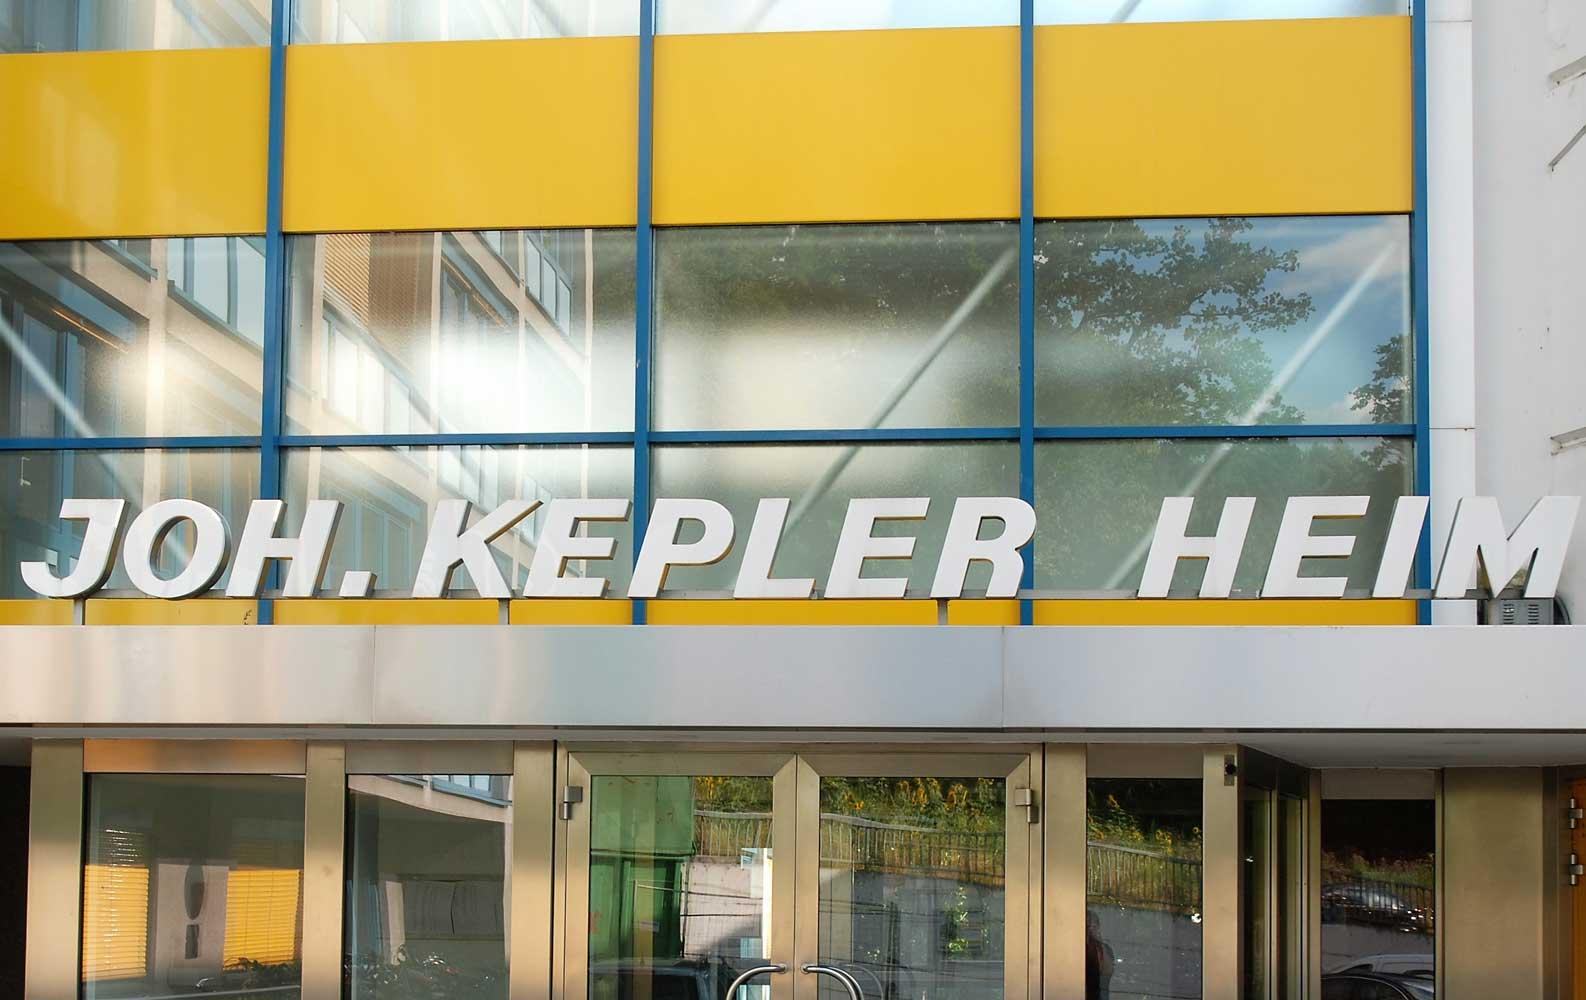 Joh. Kepler Heim